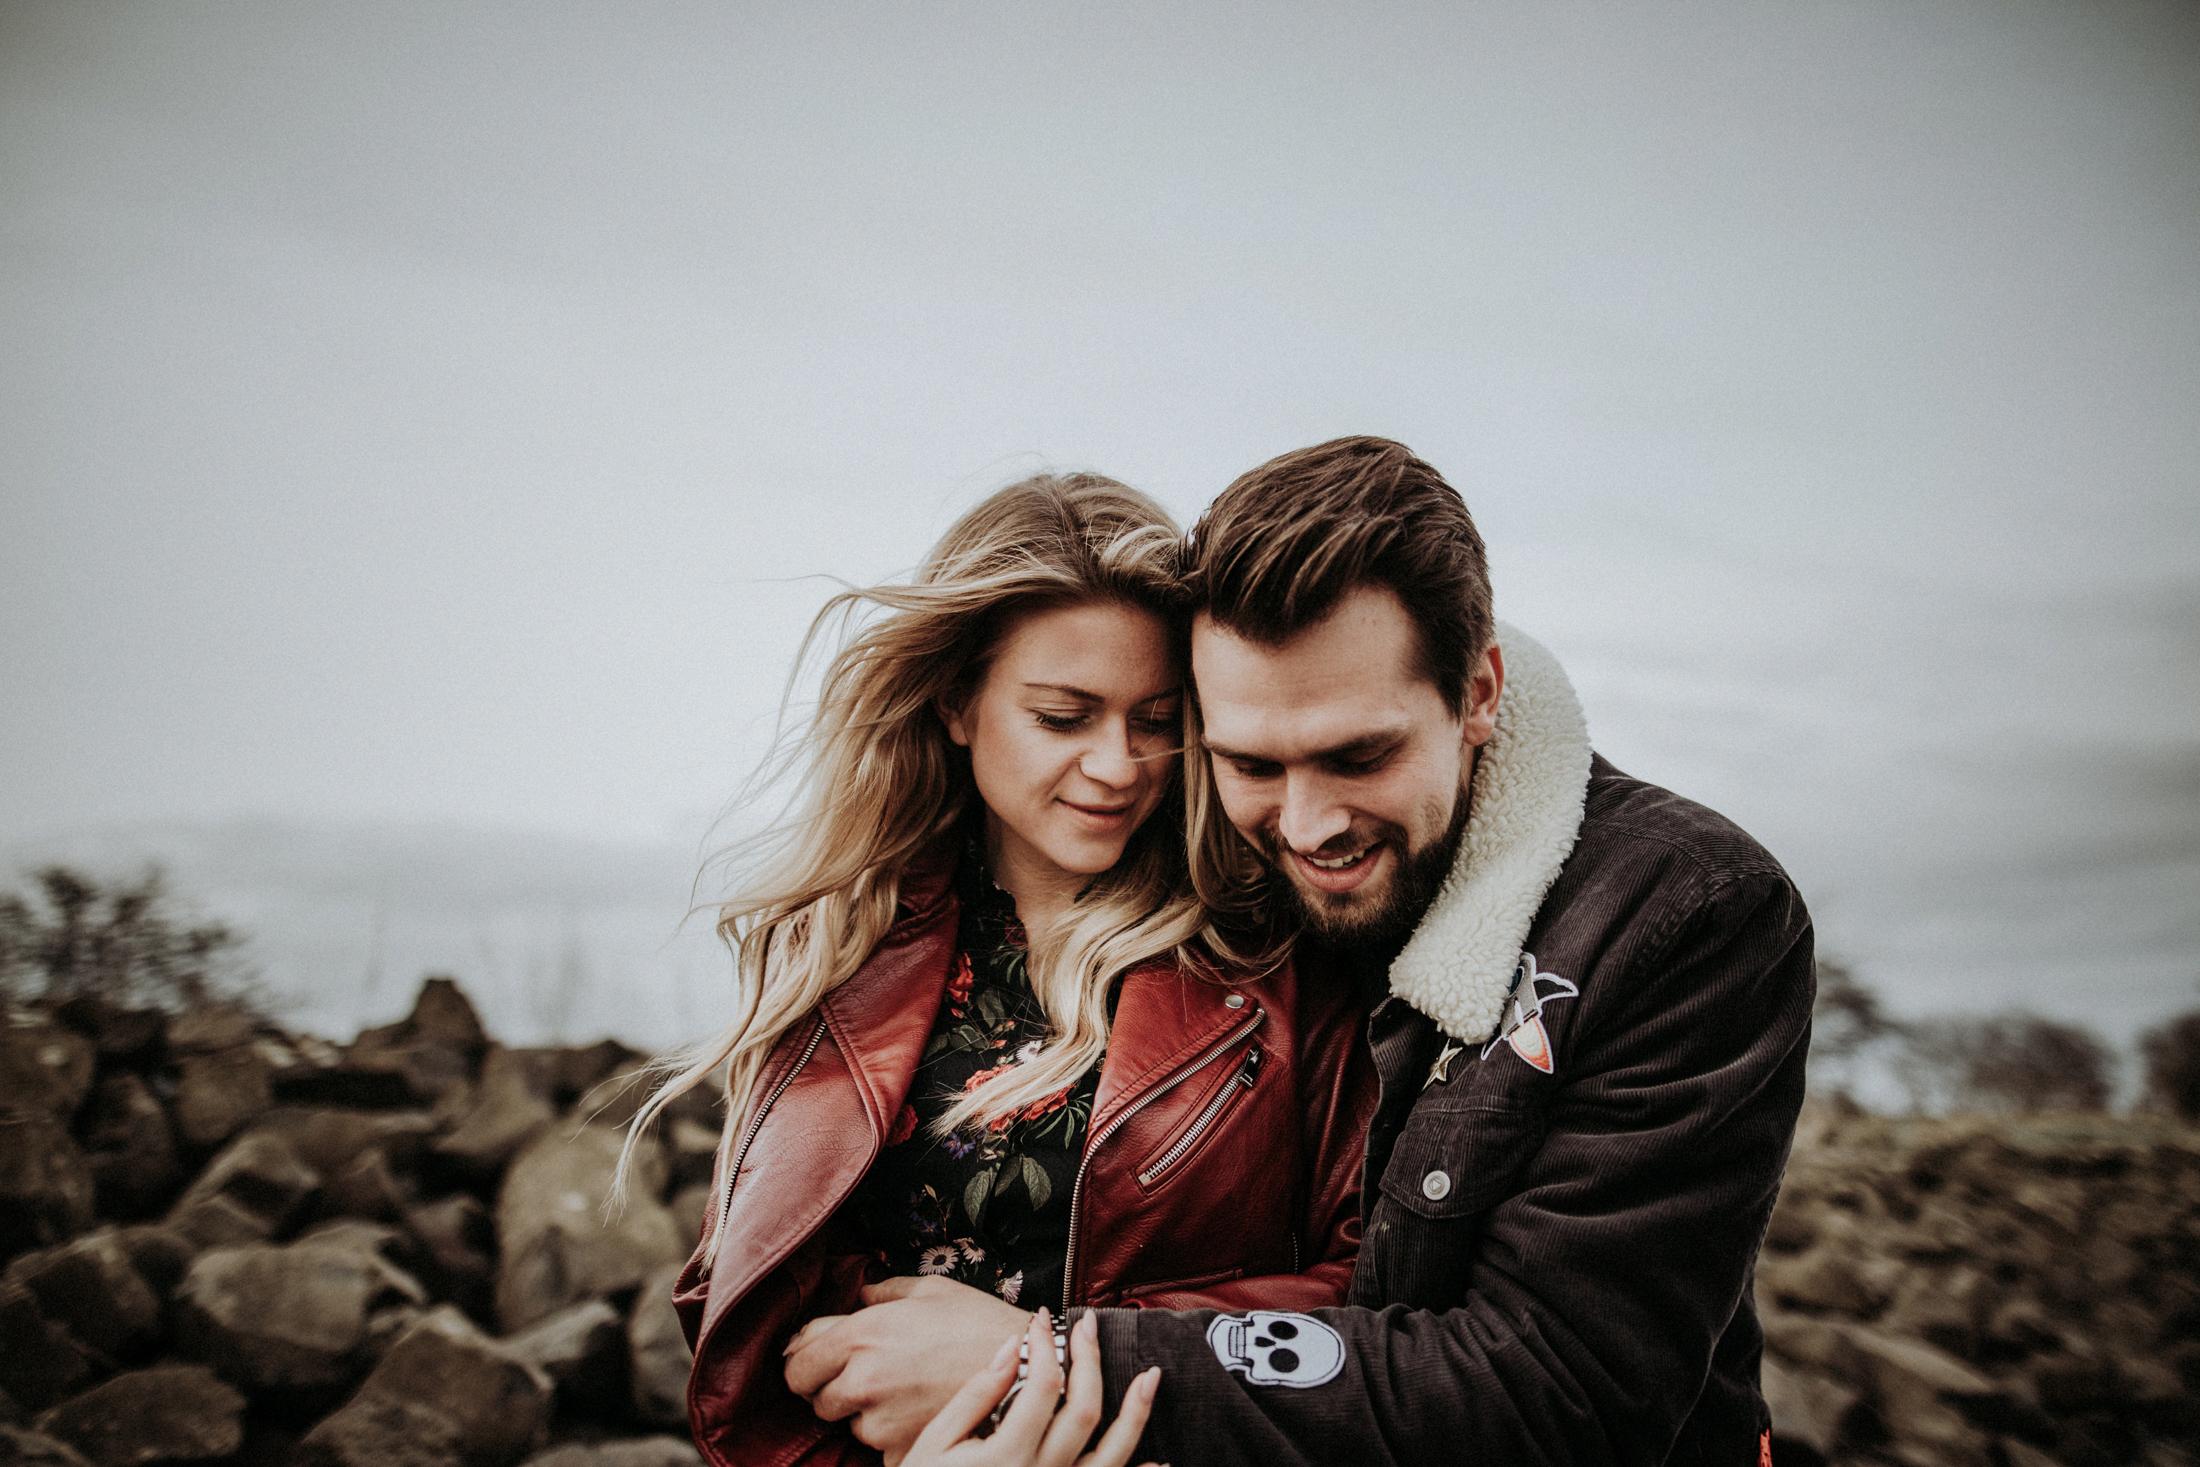 Wedding_Photographer_Mallorca_DanielaMarquardt_Photography_CanaryIslands_Lanzarote_Iceland_Tuscany_Santorini_Portugal_NewYork_Spain_Elopement_Hochzeitsfotograf_CK35